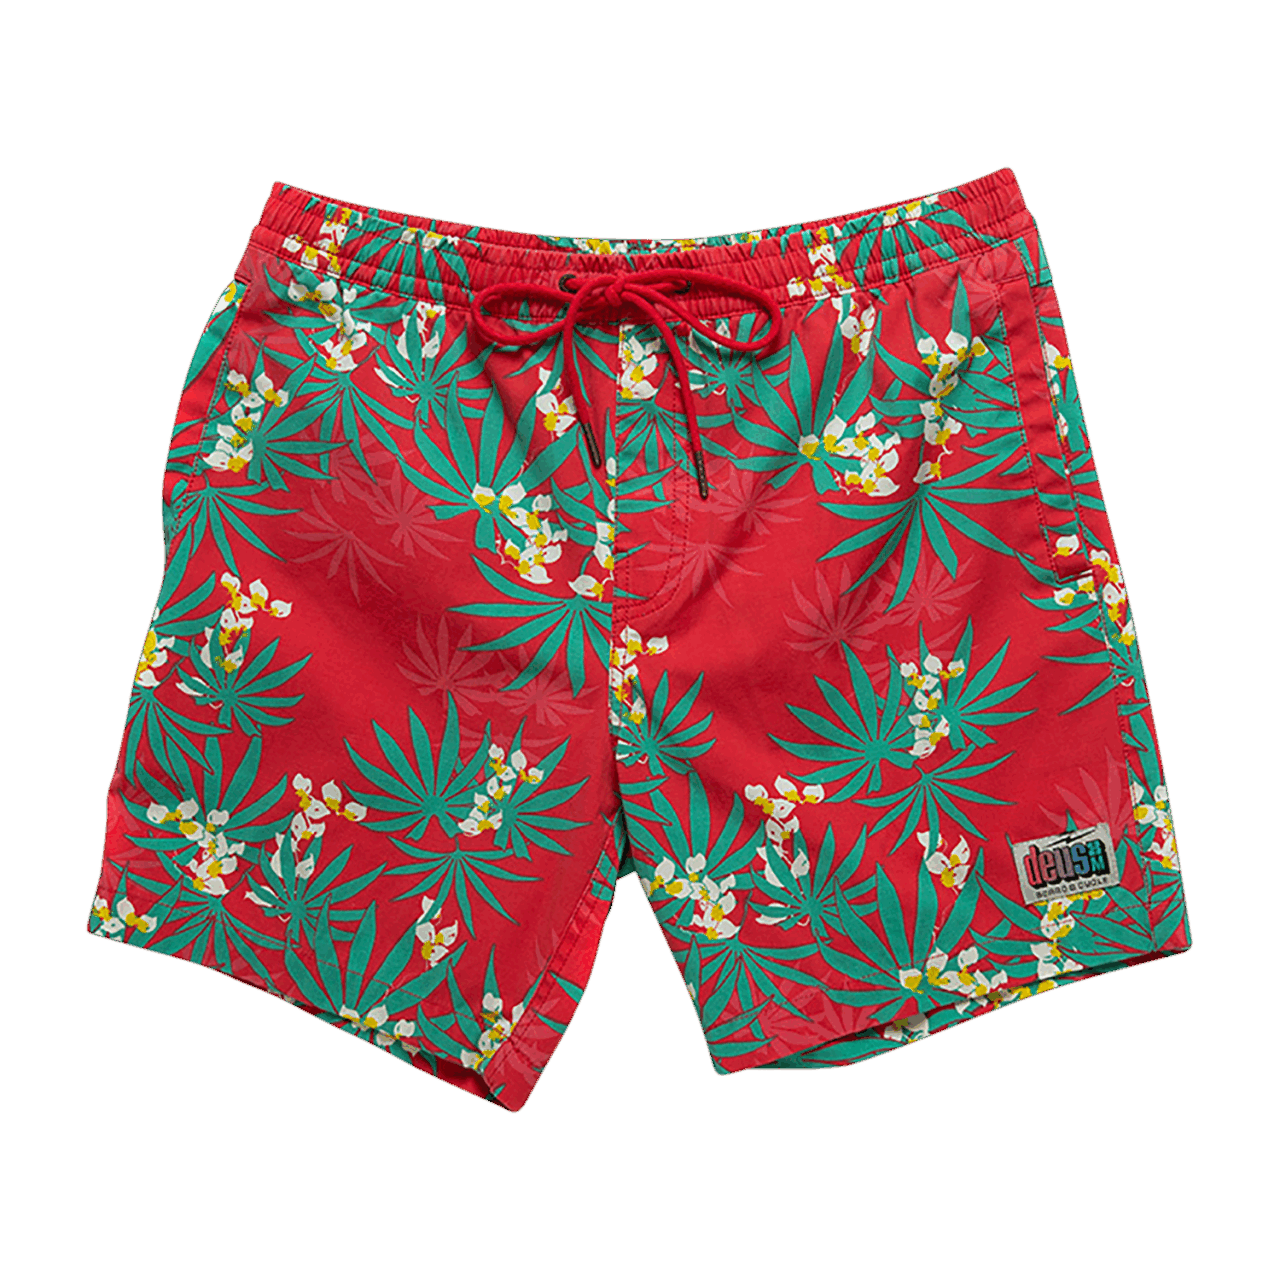 Deus Sandbar Monkey Puzzle Shorts - Poppy Red